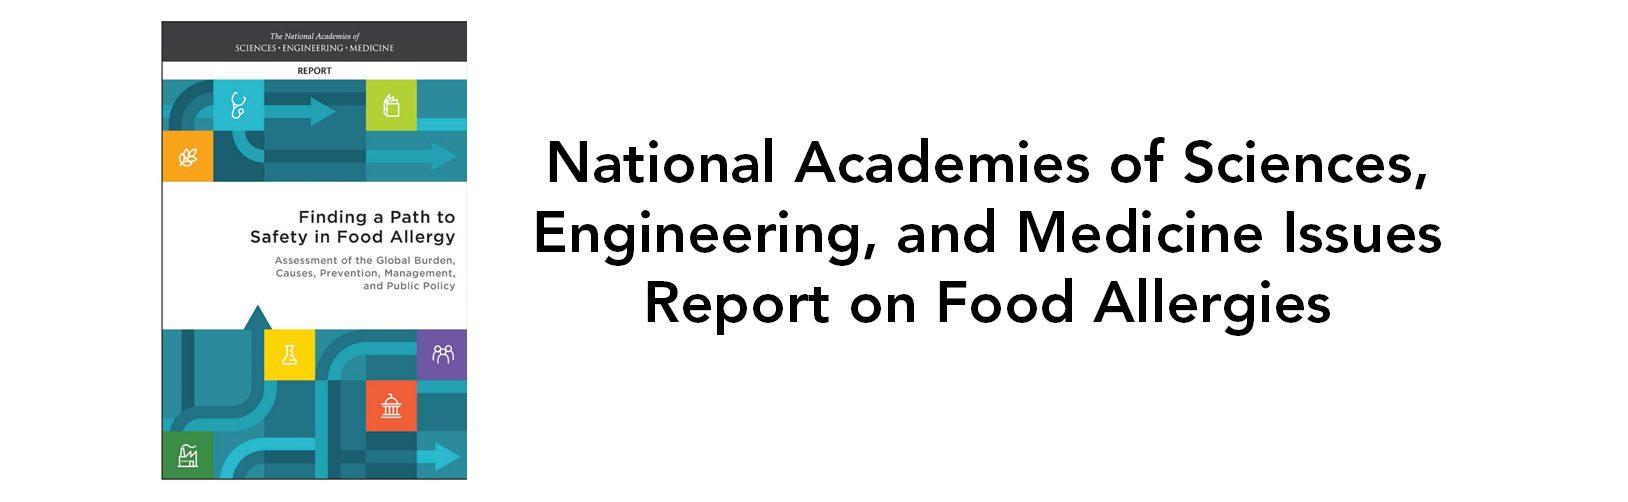 food allergies report